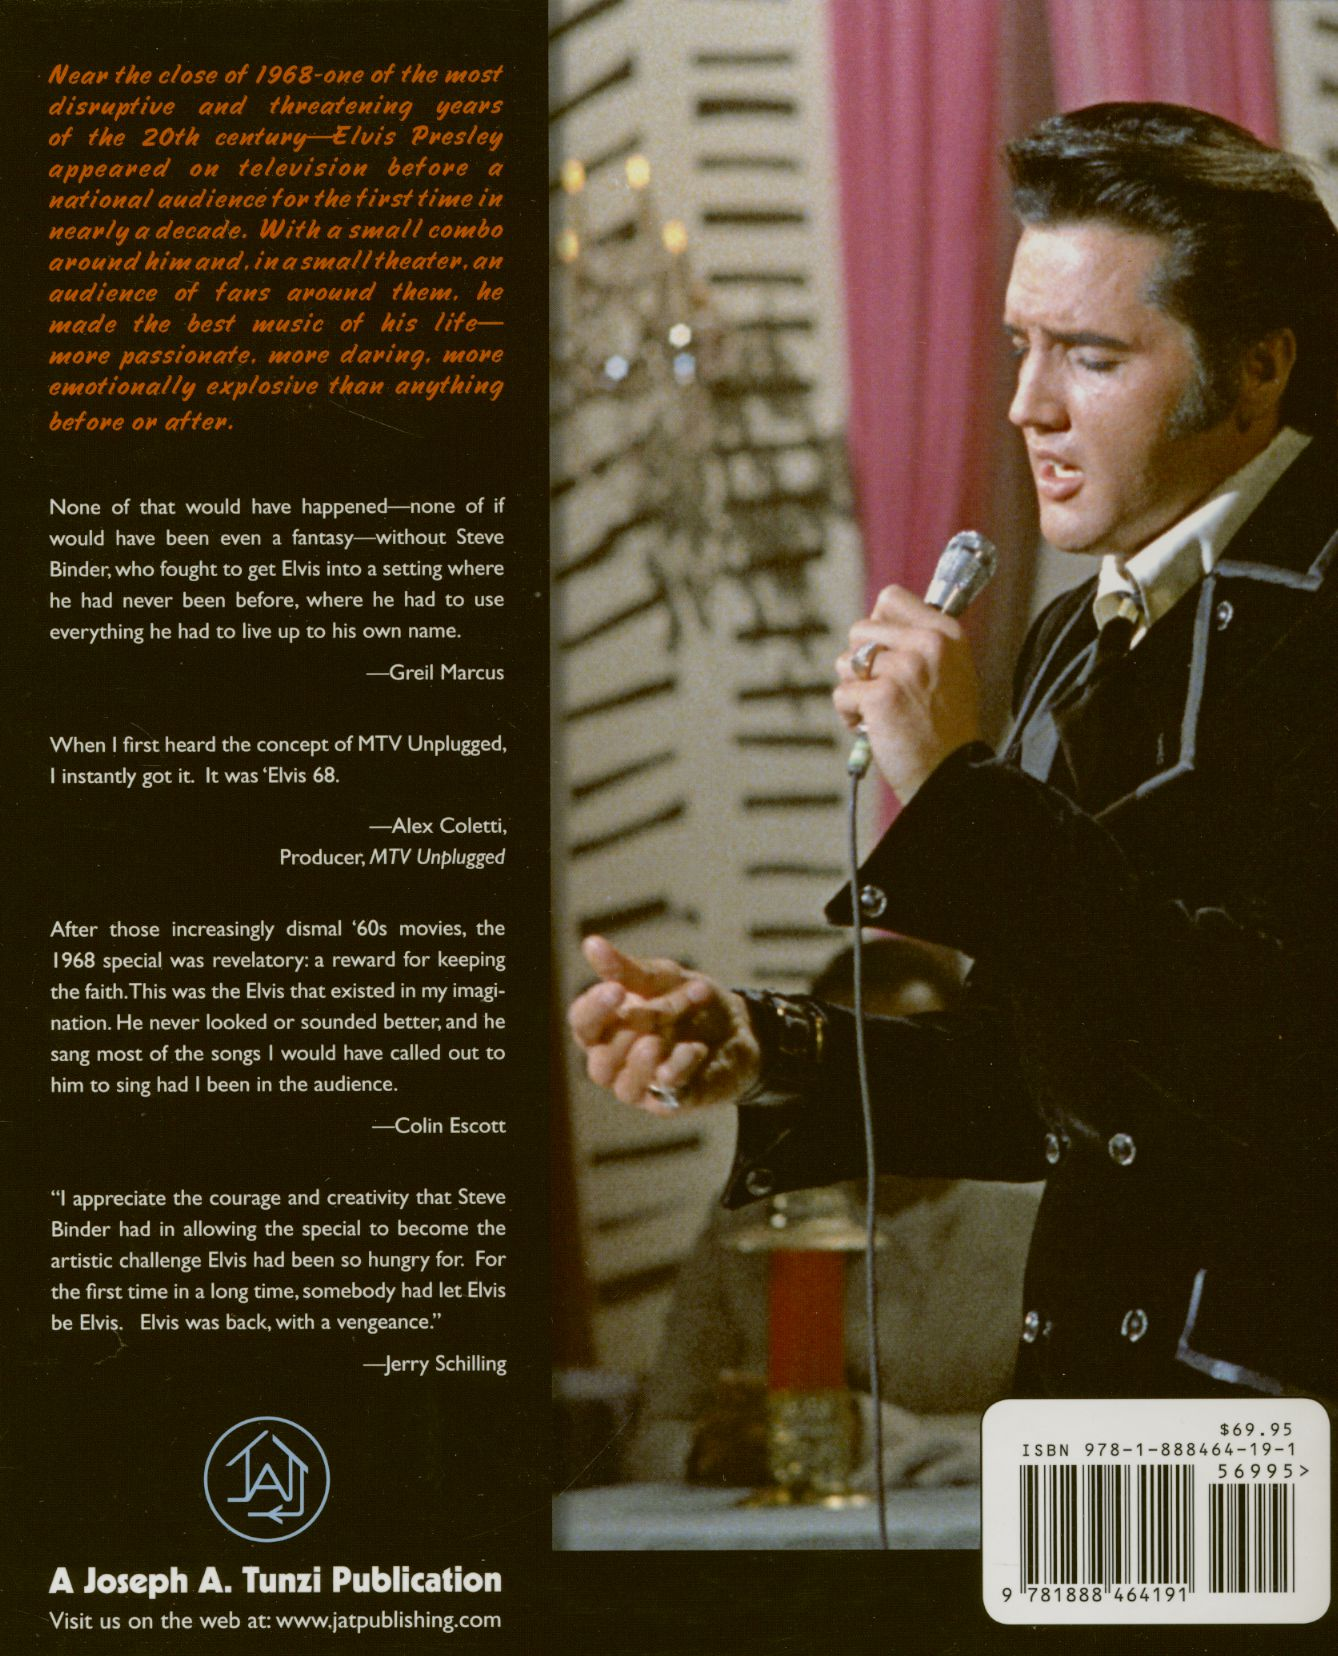 Elvis Presley Bücher/Books: 68 At 40 Retrospective